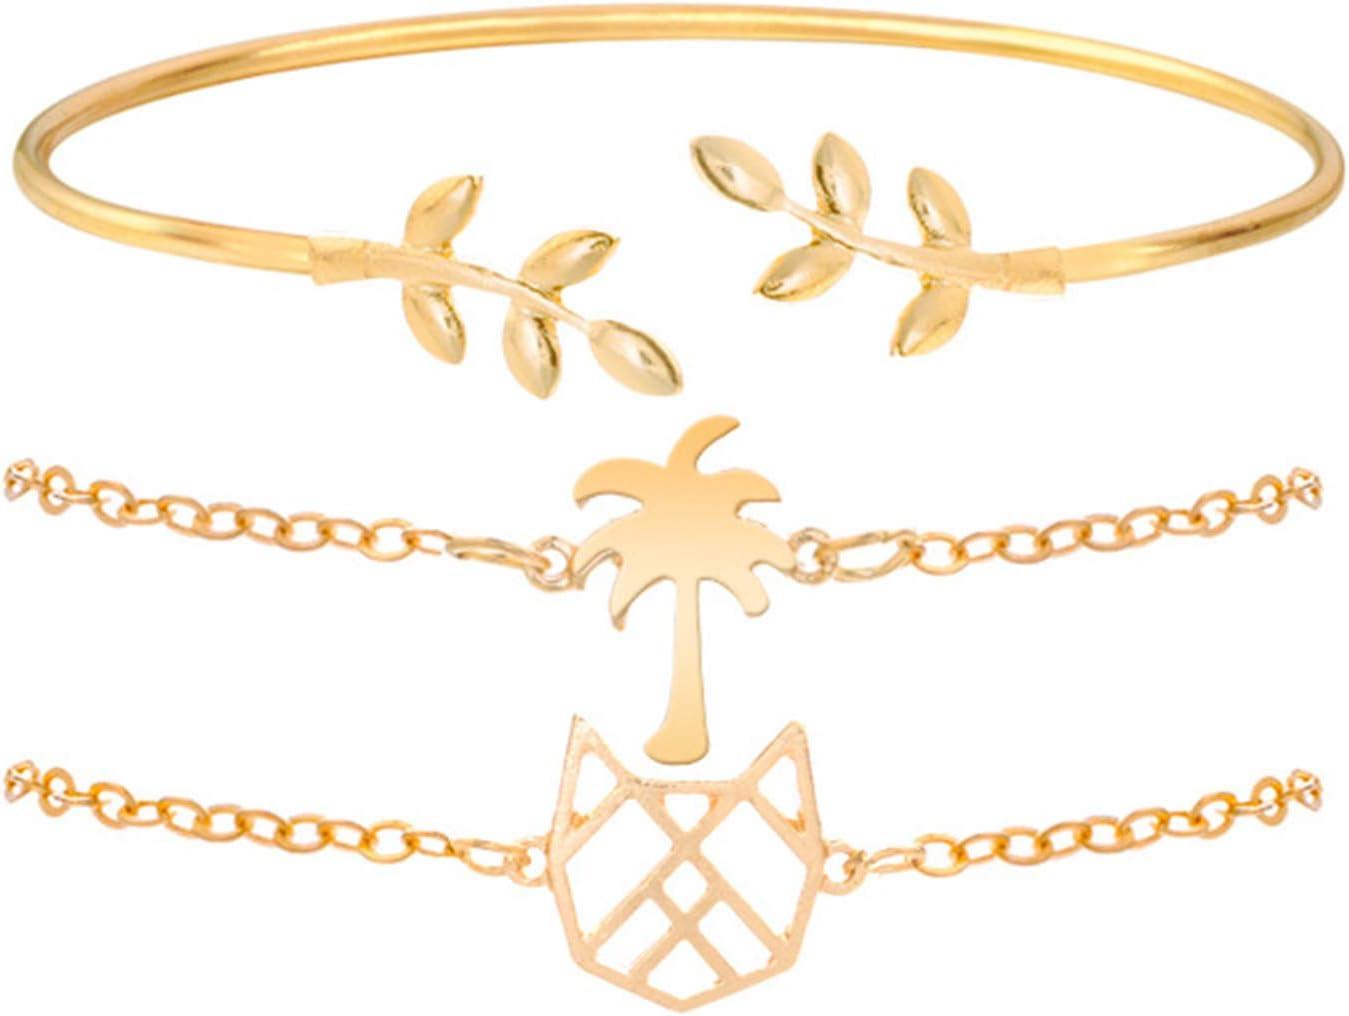 Girls' Fashion,Bracelet,3Pcs/Set Creative All-Match Adjustable Leaf Coconut Tree Bracelet Cuff Bangle Jewelry Accessory - Golden